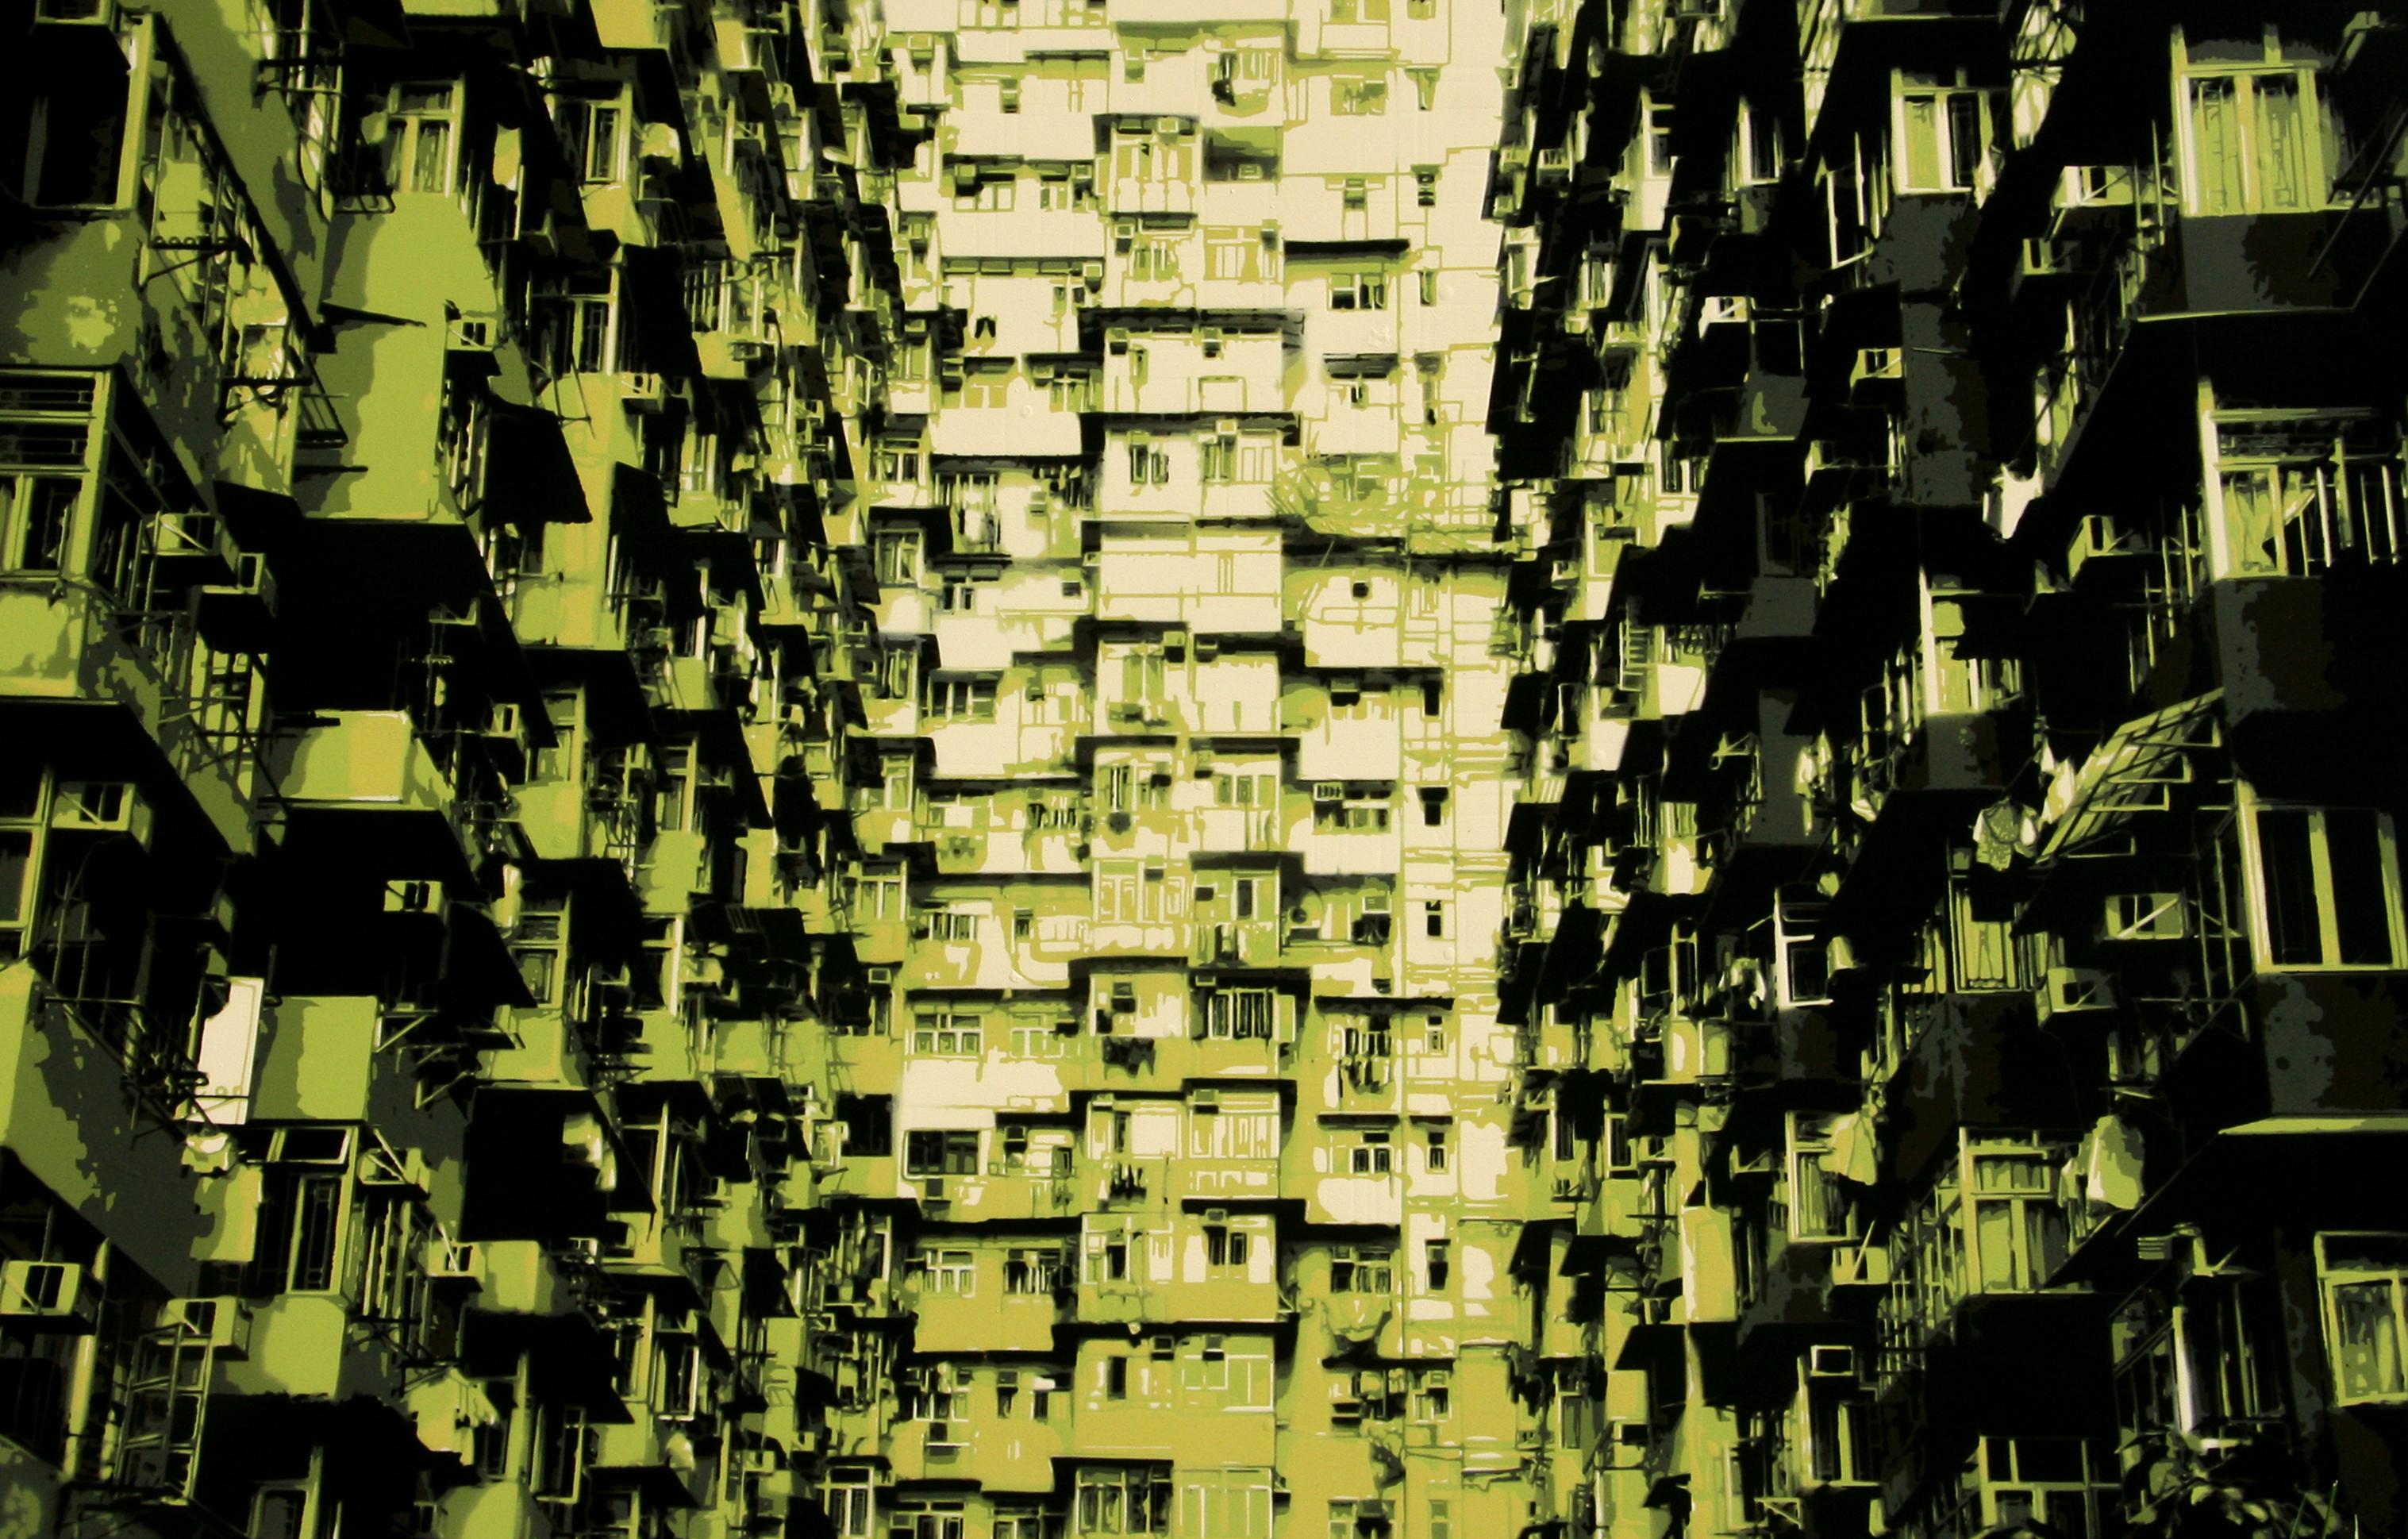 Human factory by kingstom